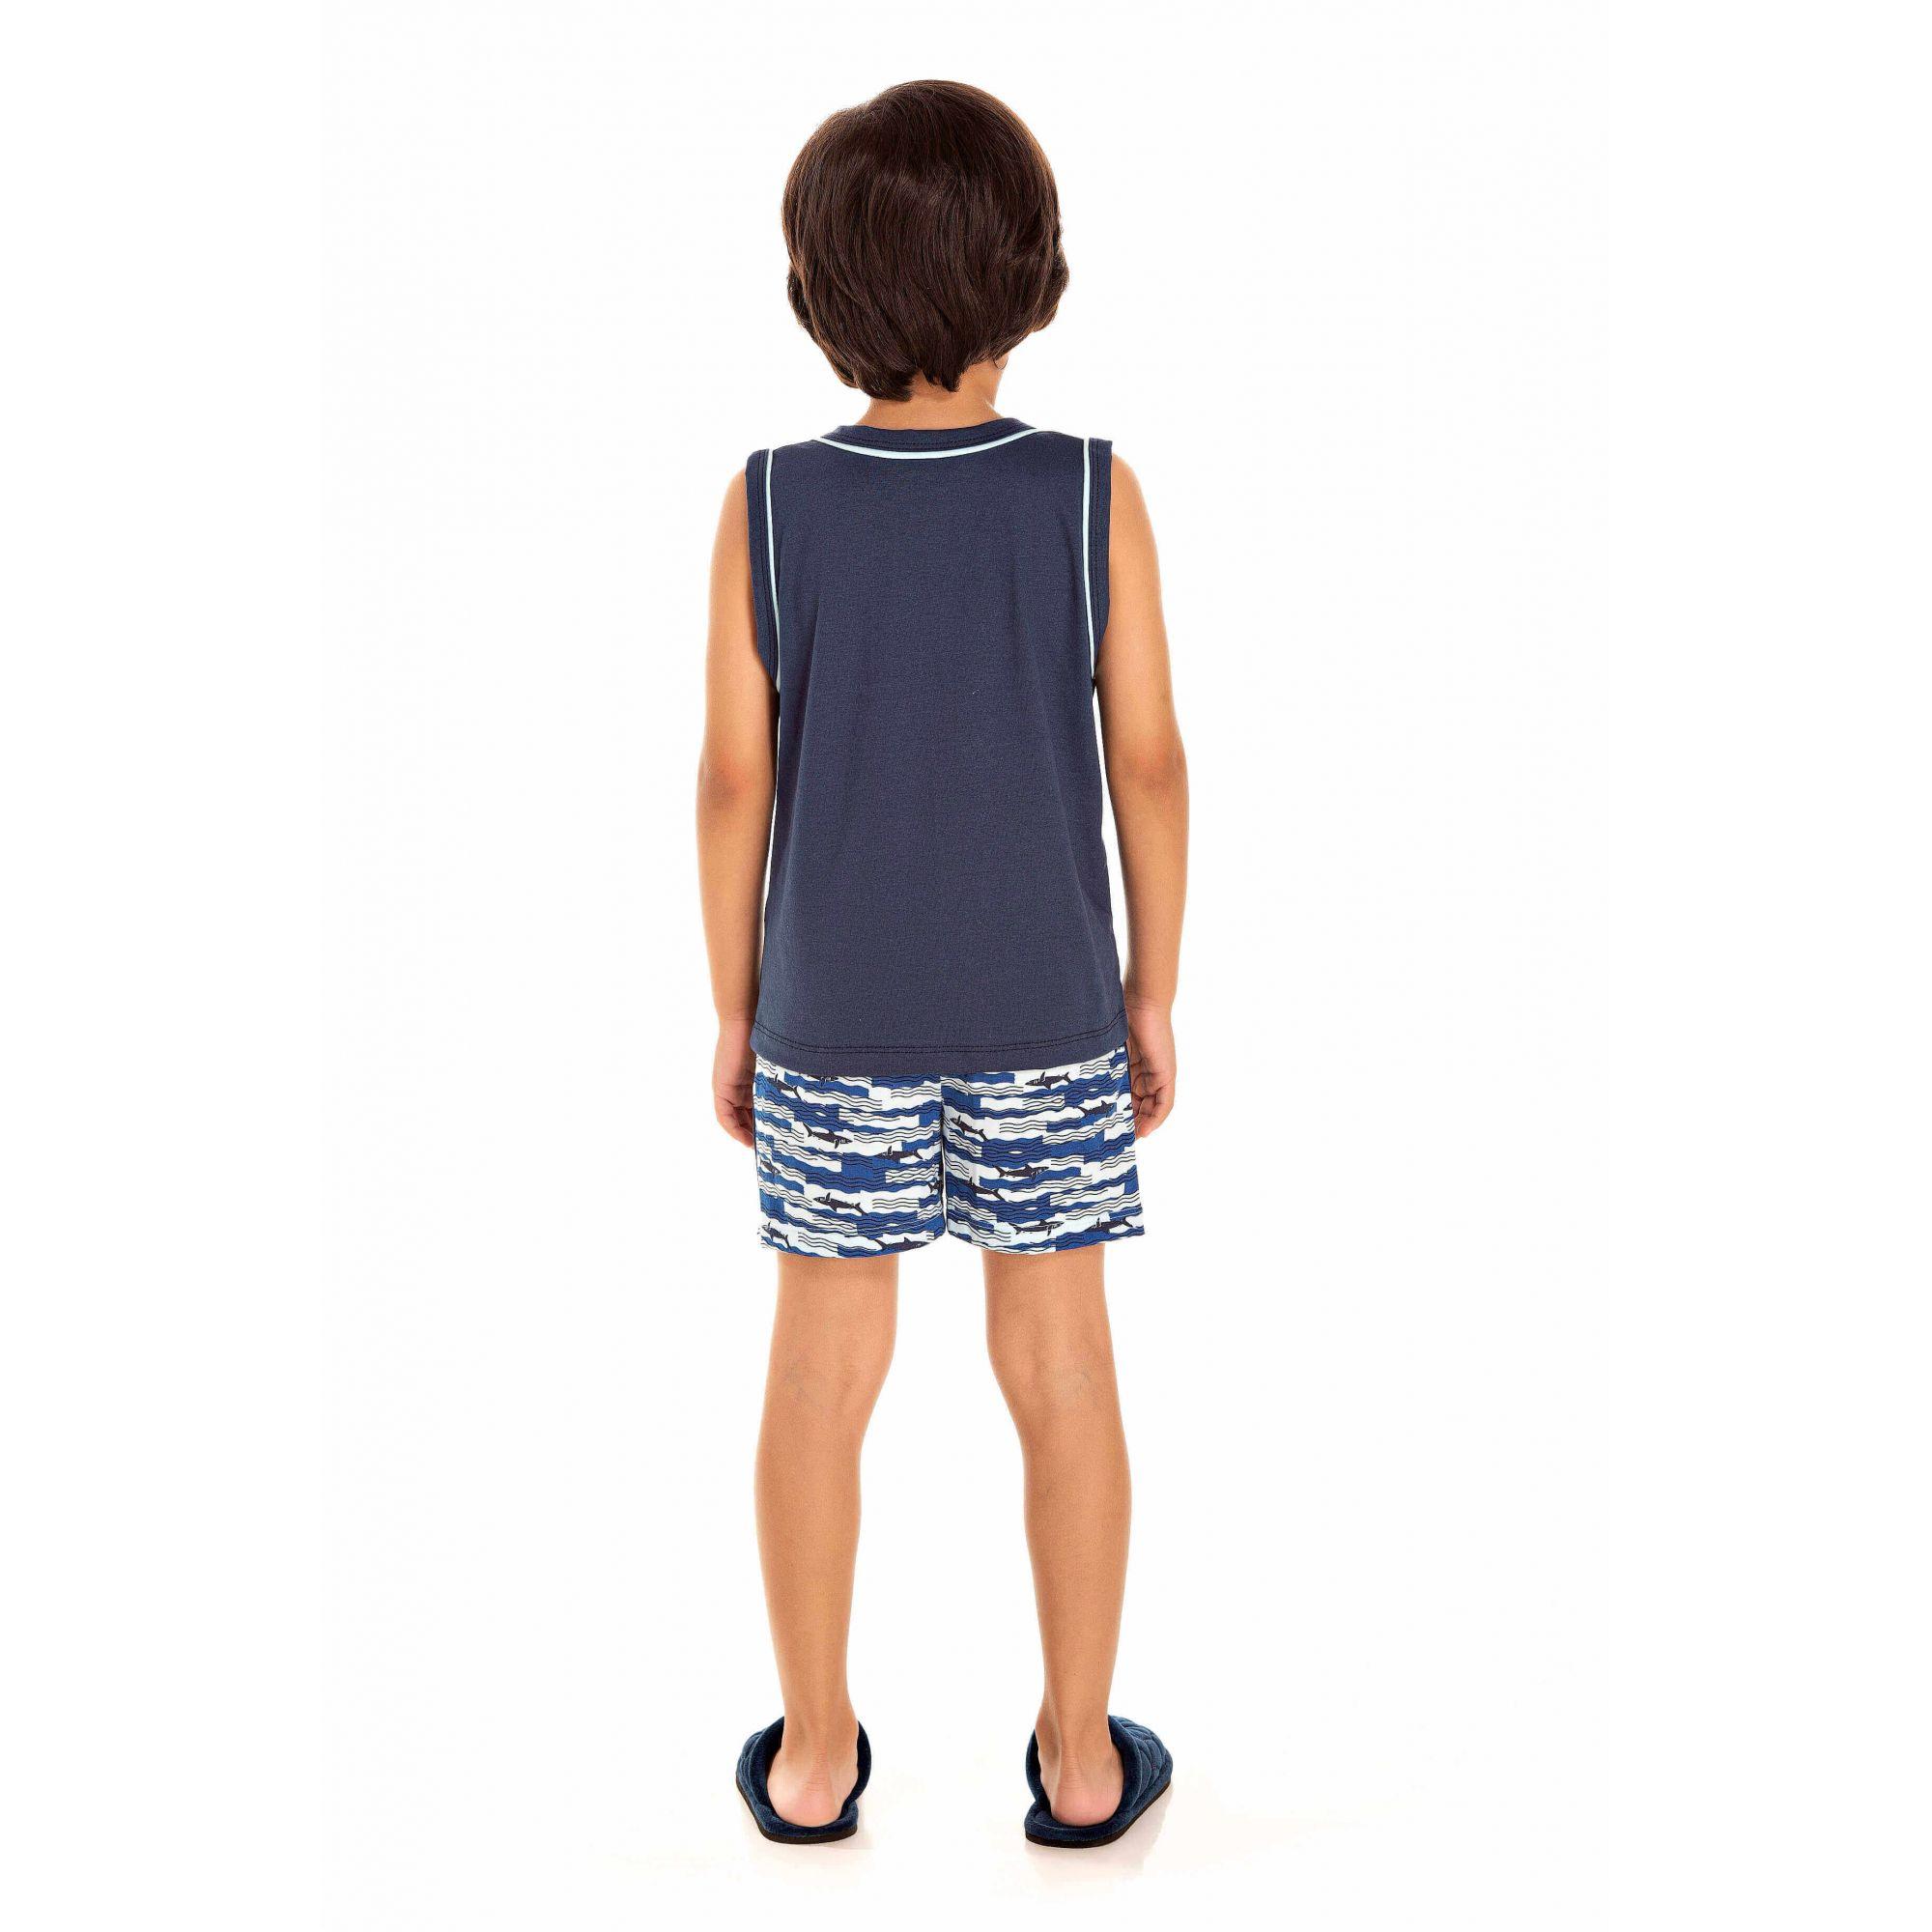 102/E - Pijama Infantil Masculino Shark Attack